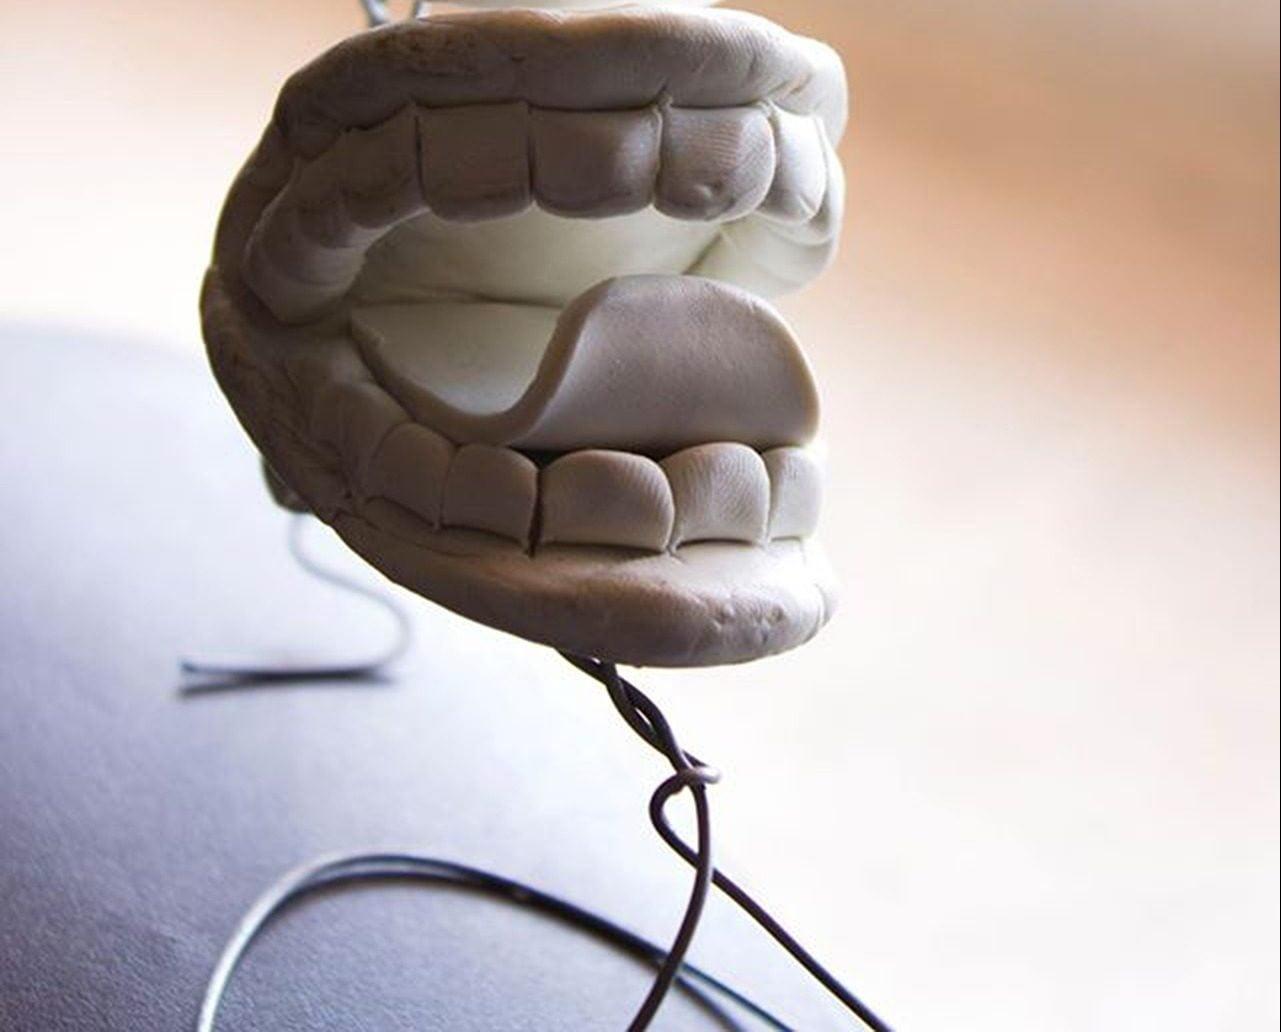 Spanning in je kaken geeft spanning in je lijf